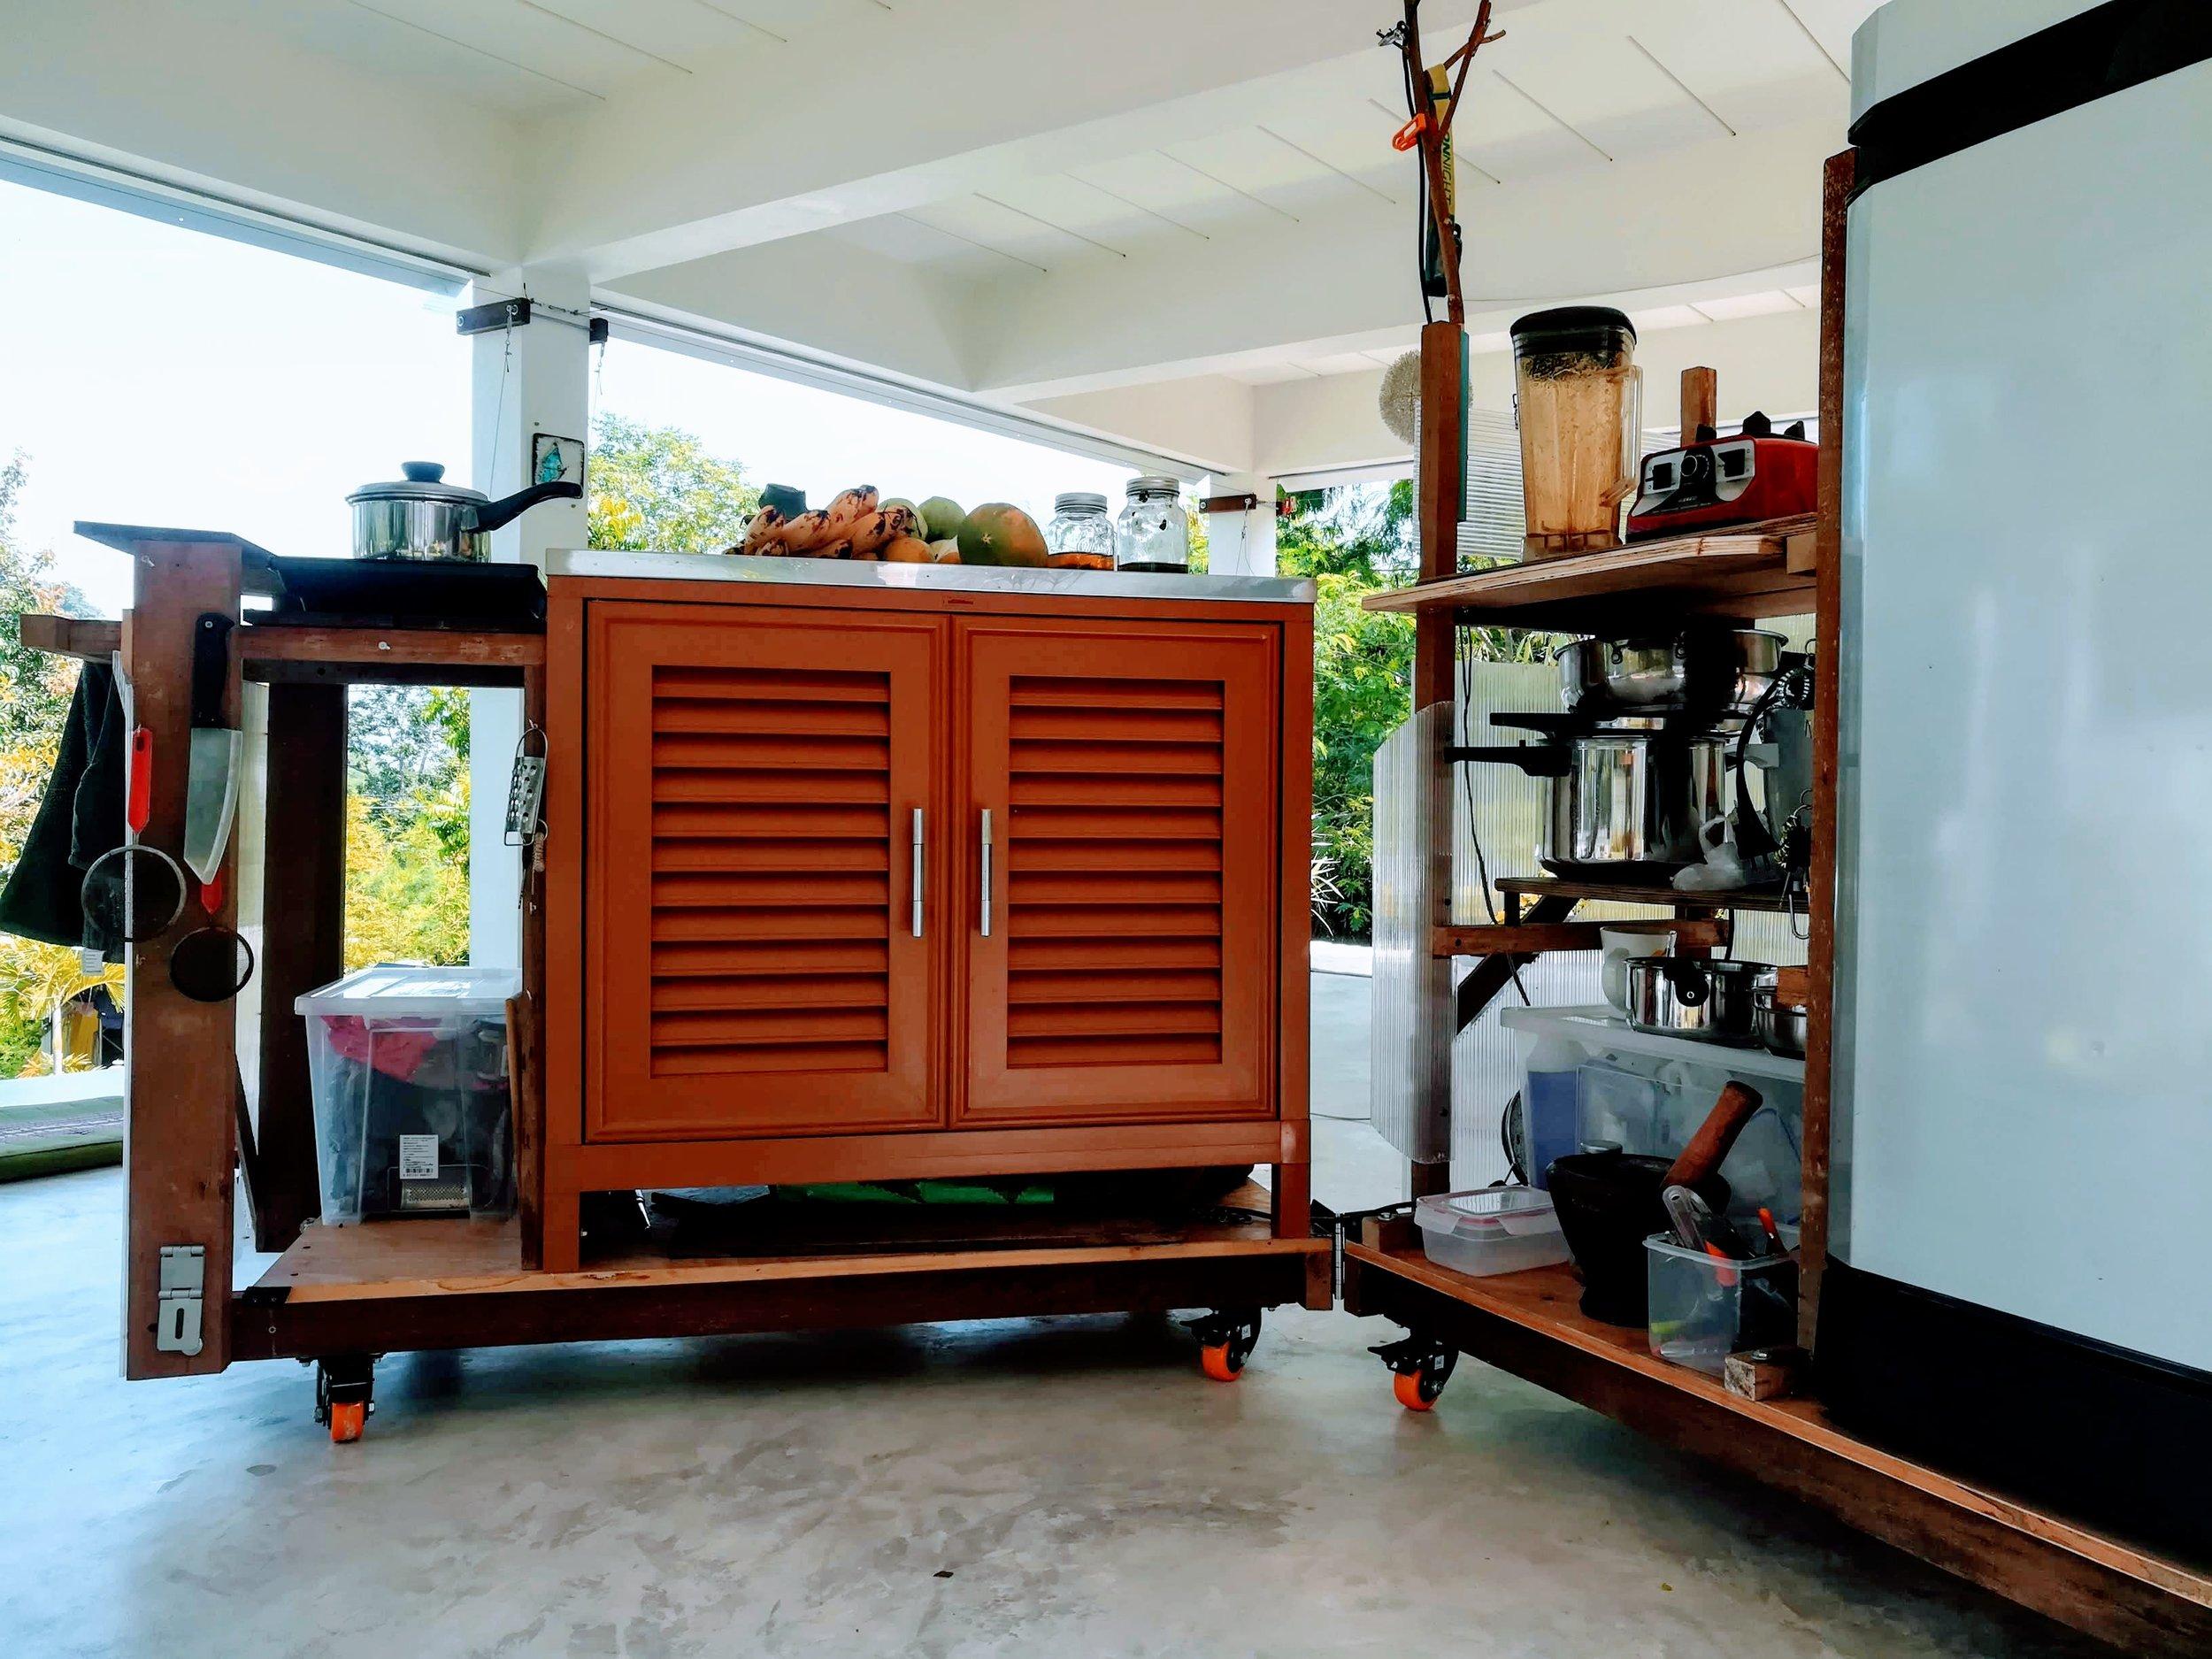 Innovative kitchen on wheels